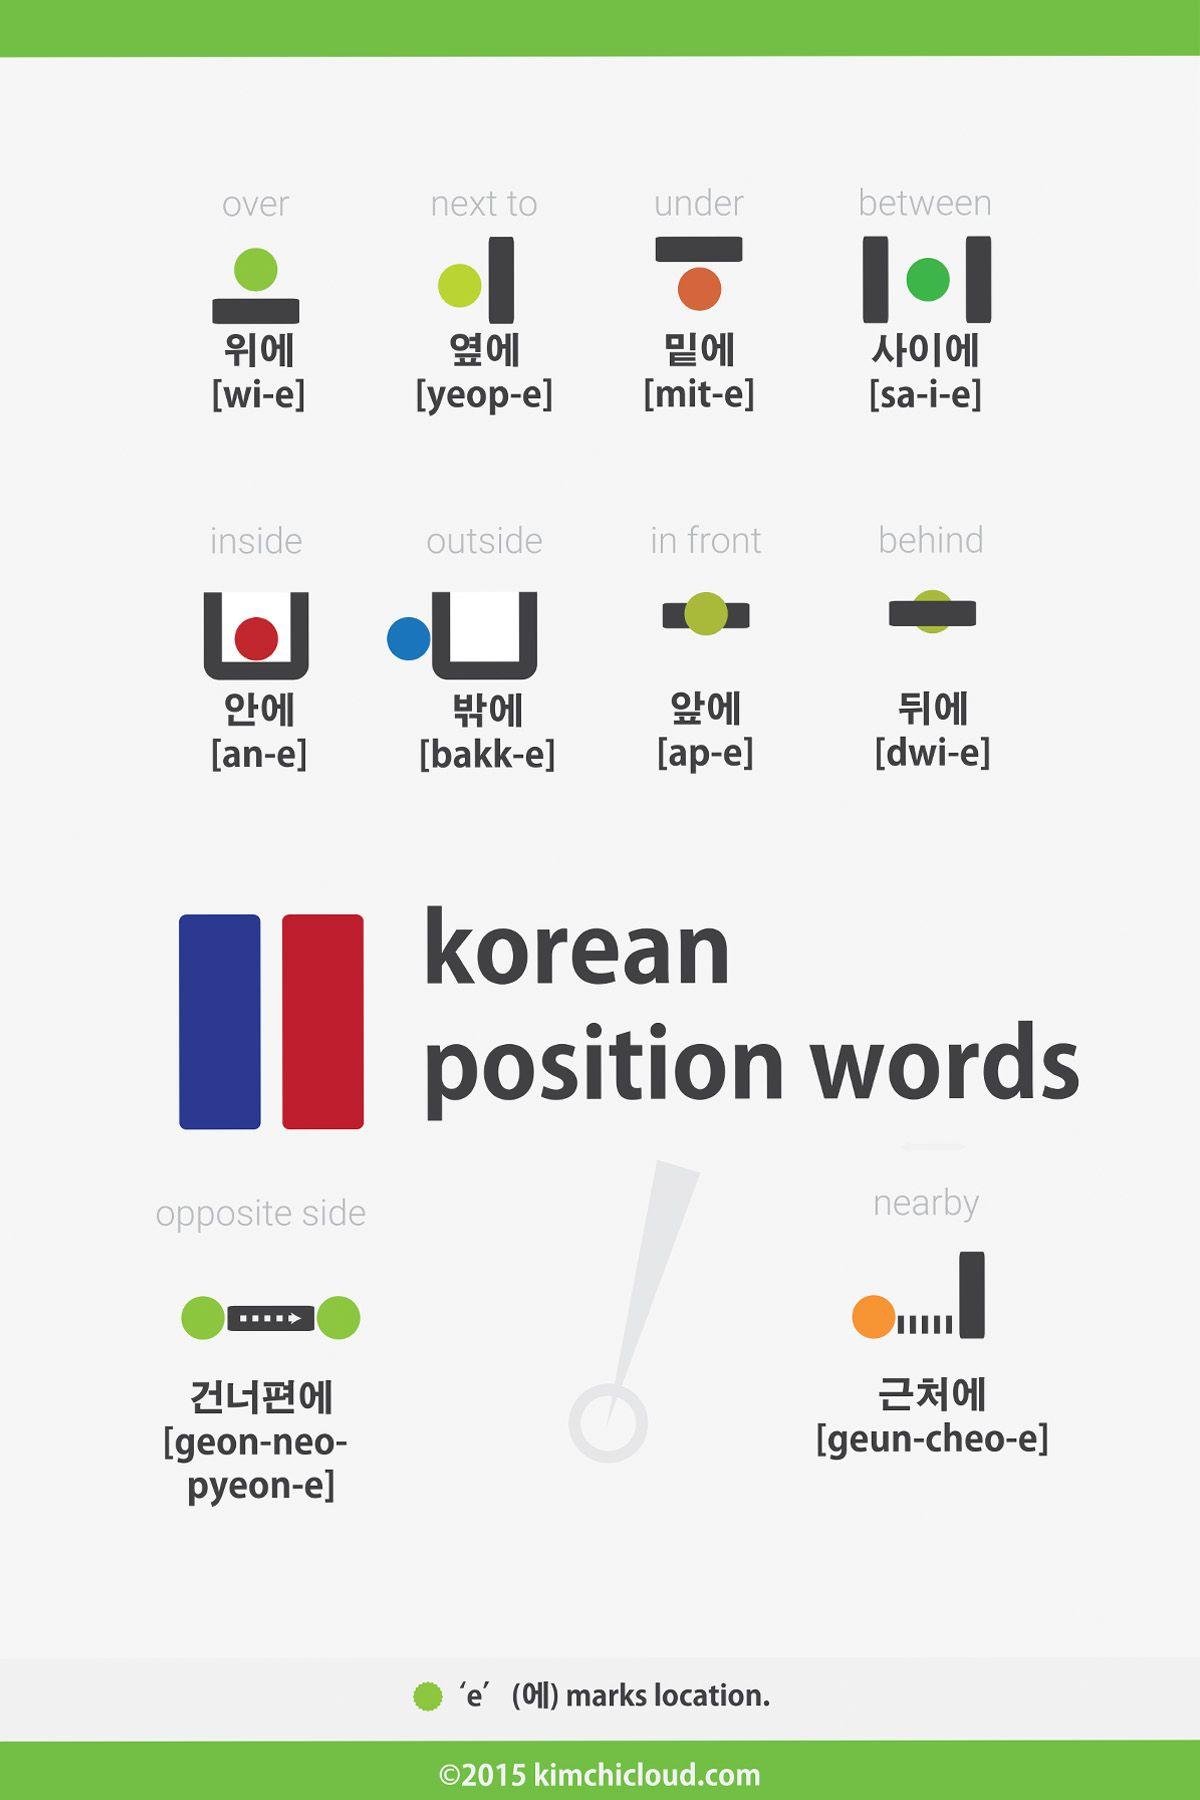 Korean Position Words Prepositions Over